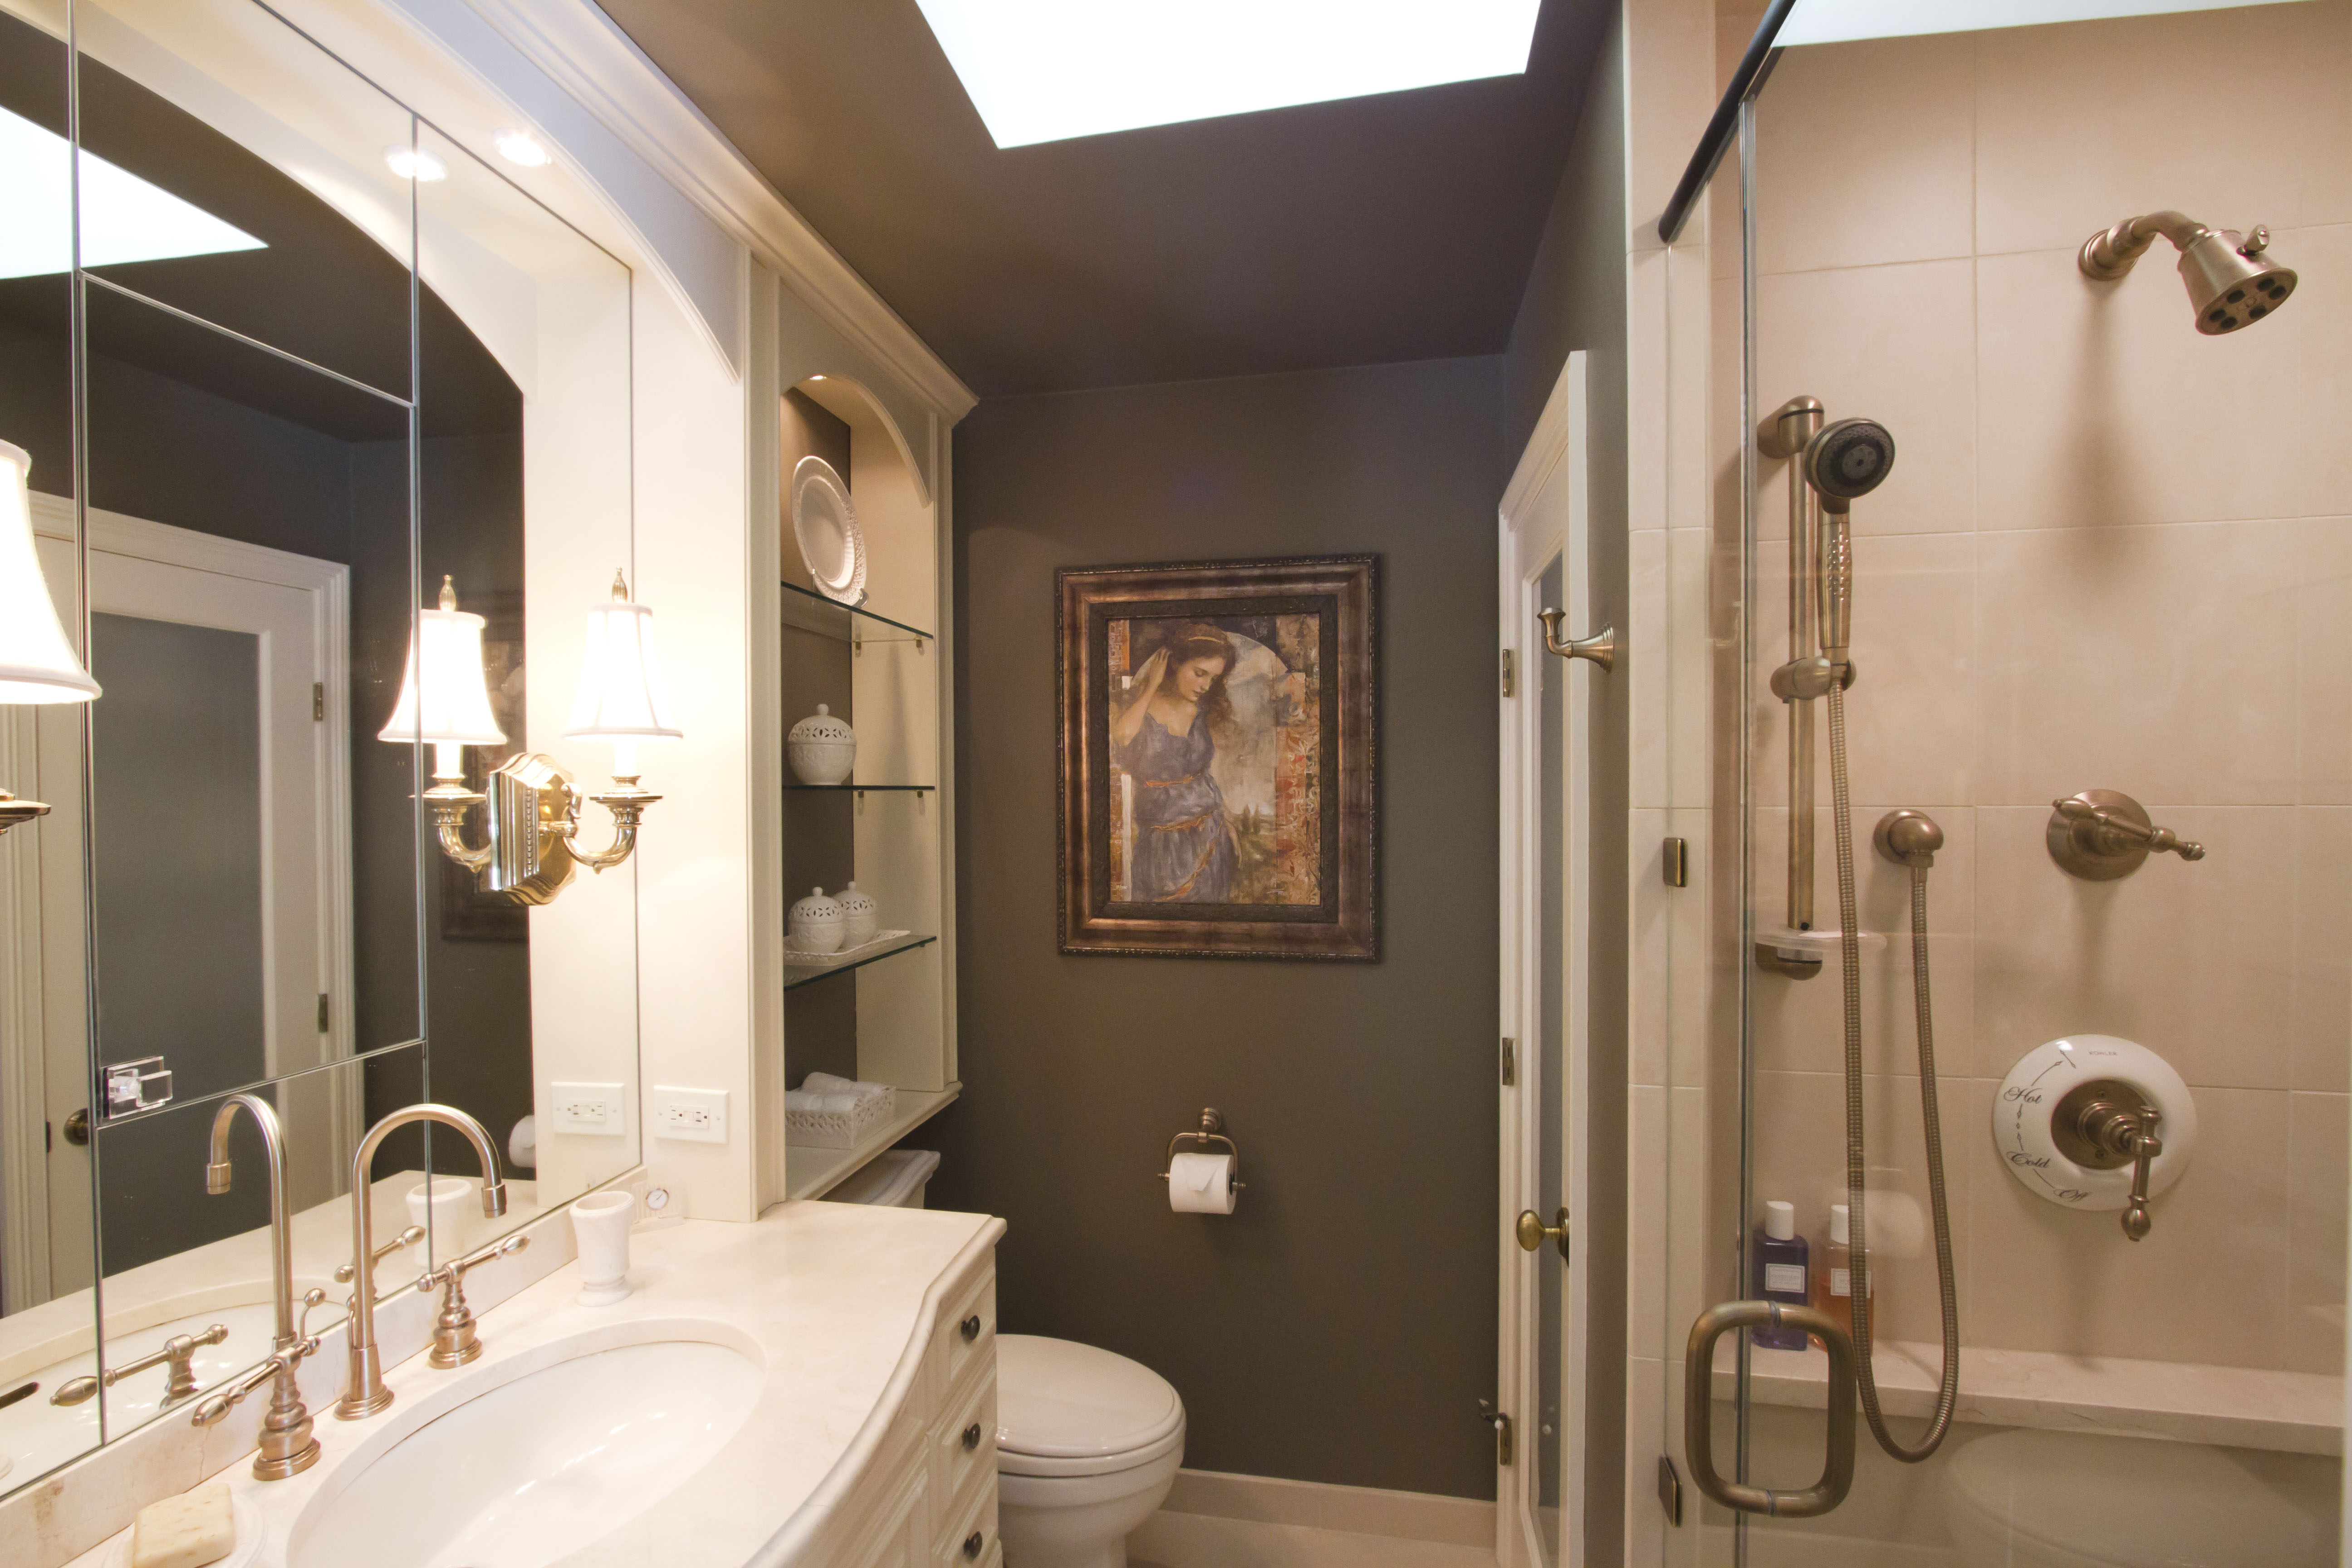 new bathroom medicine cabinet decoration-Fascinating Bathroom Medicine Cabinet Layout